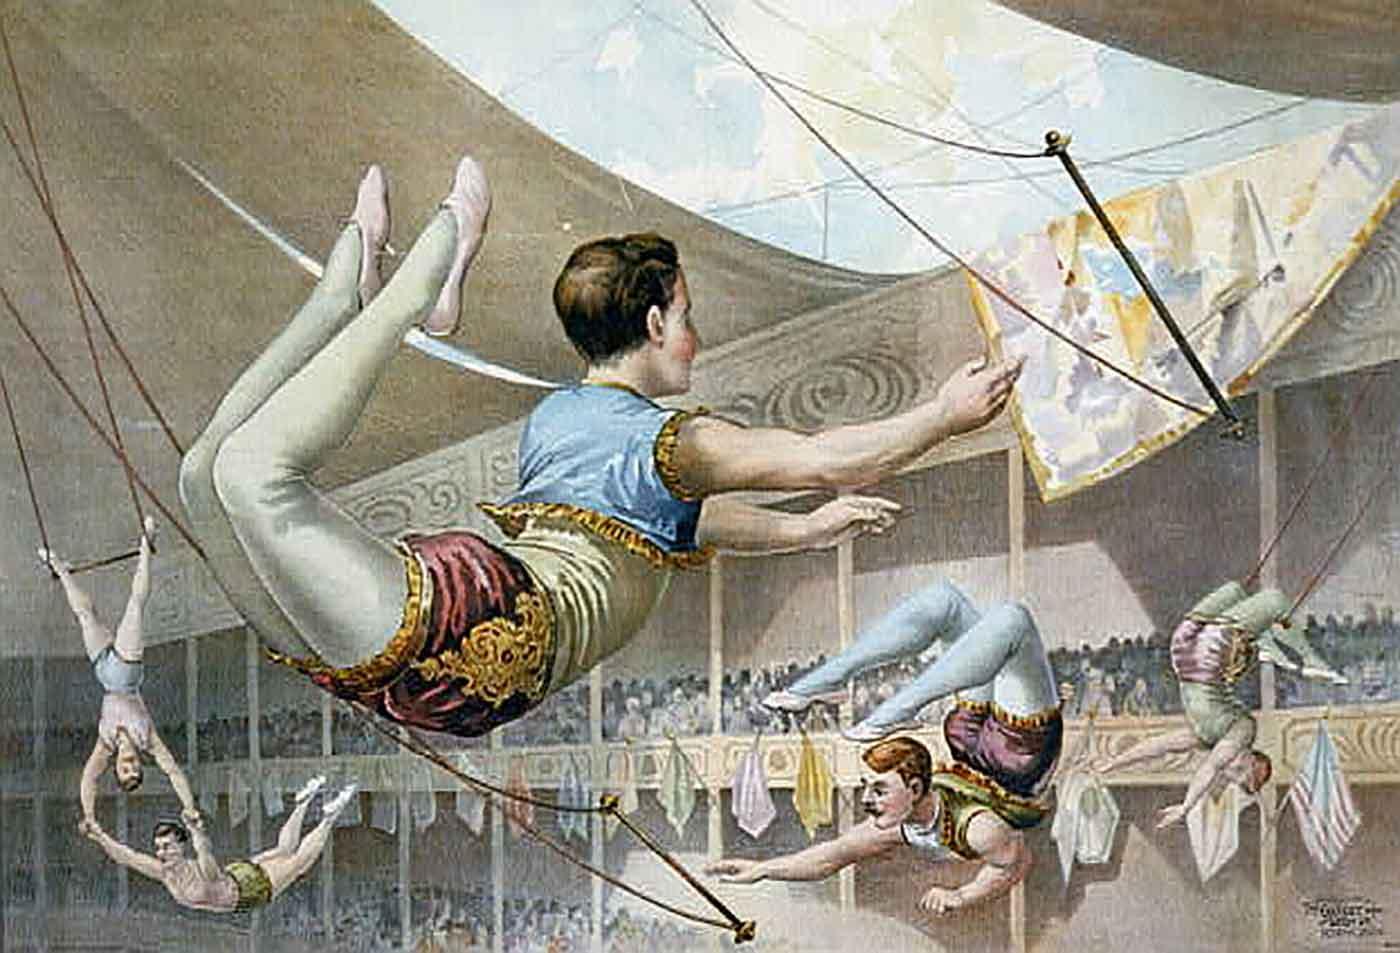 Trapeze artists 1890